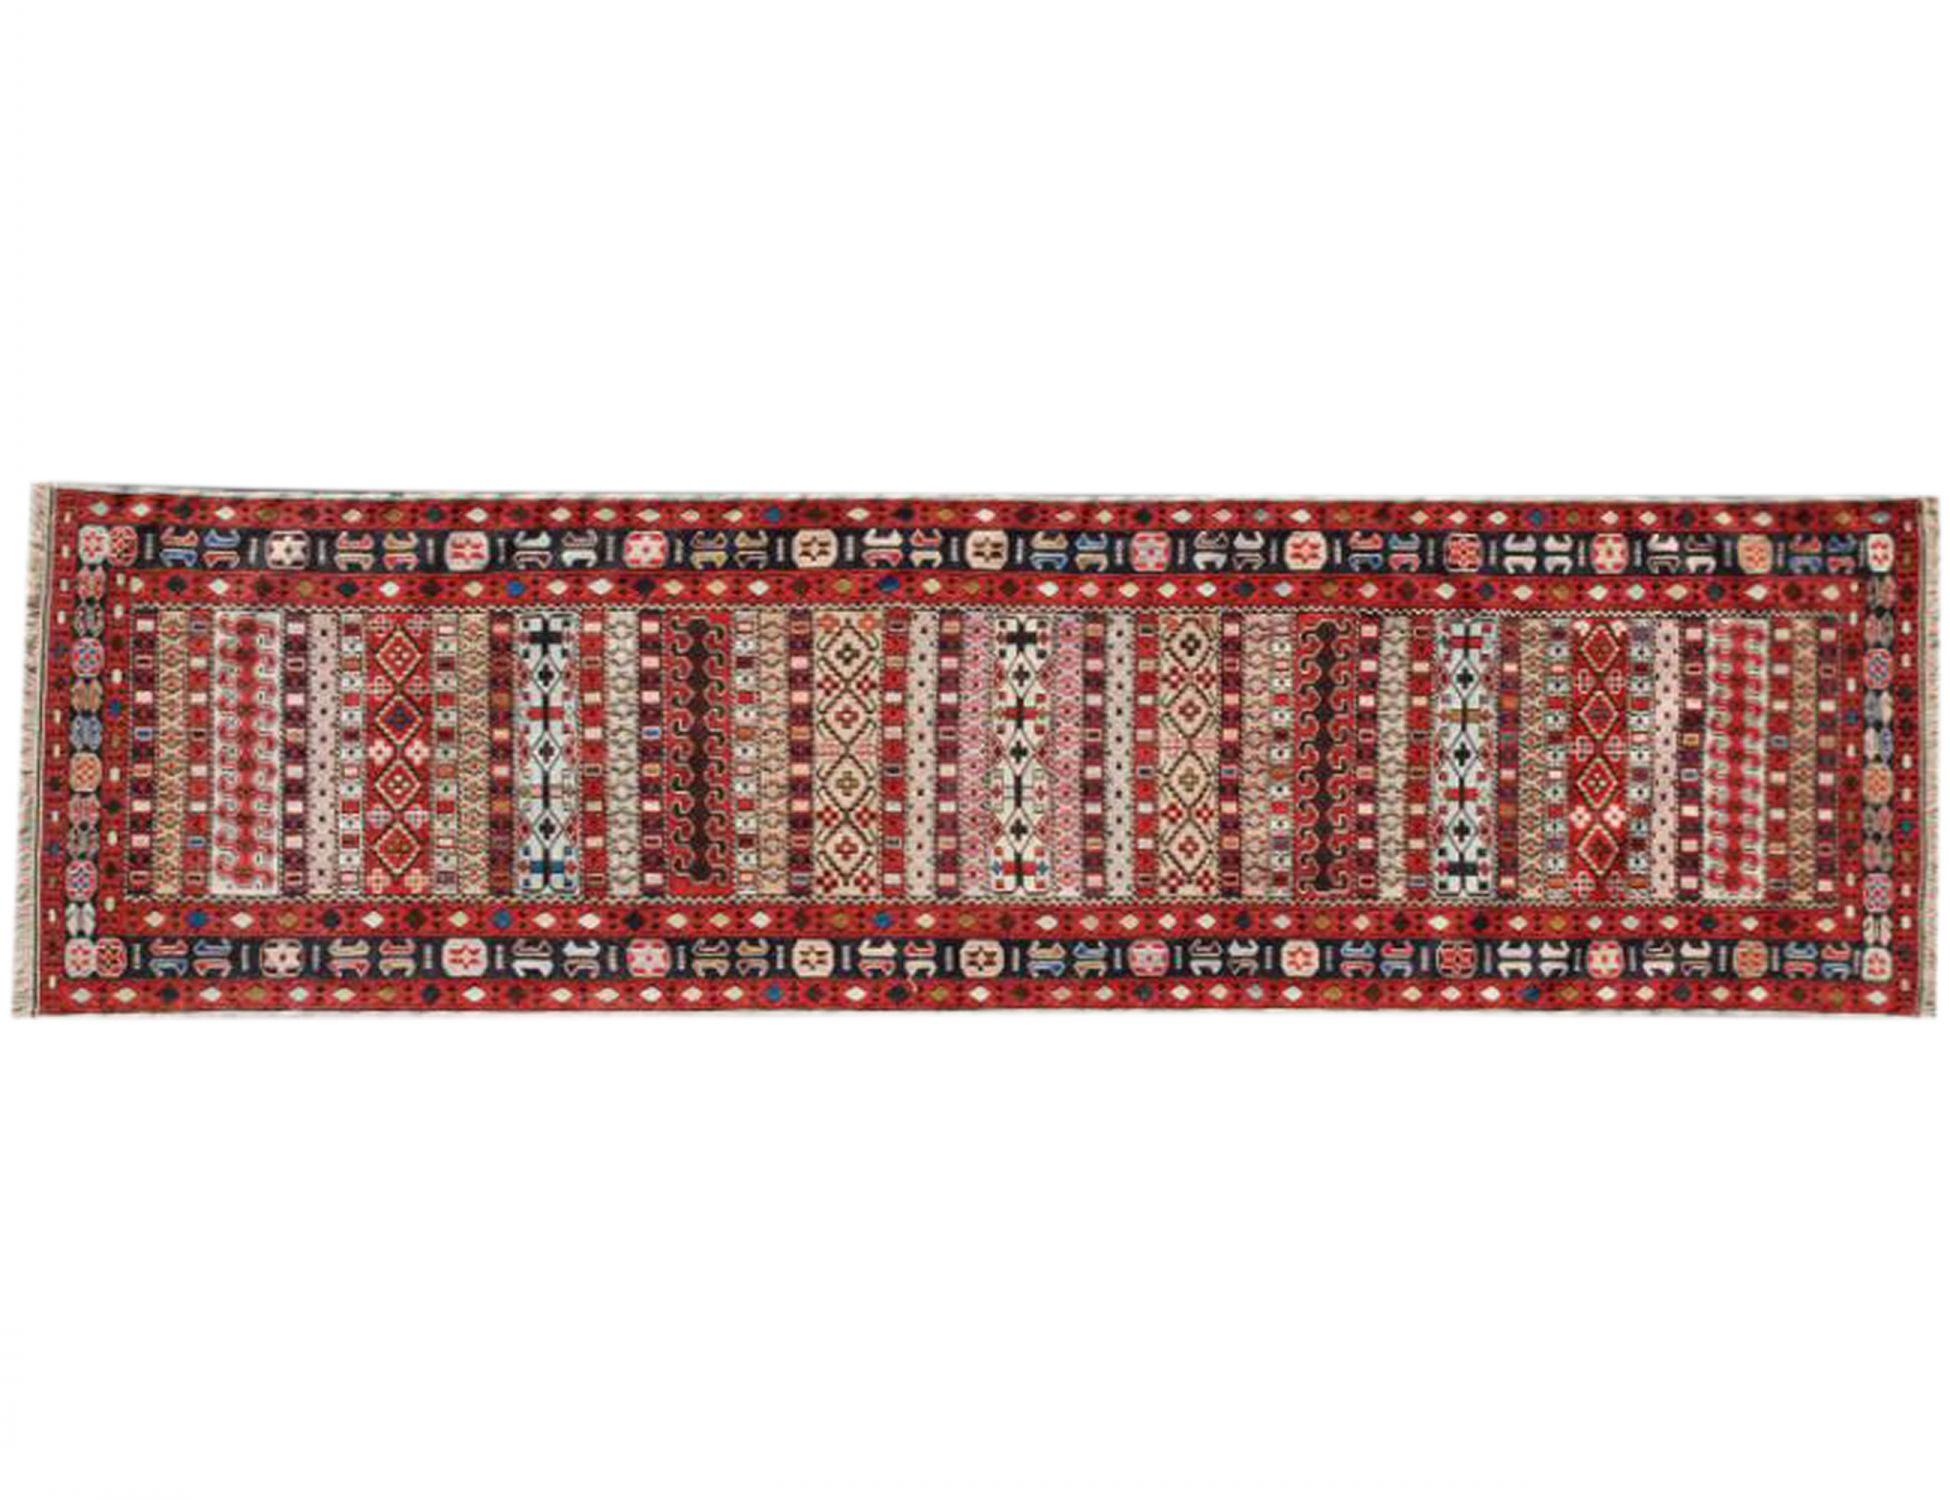 PERSIAN WOOL KILIMS    <br/>286 x 82 cm